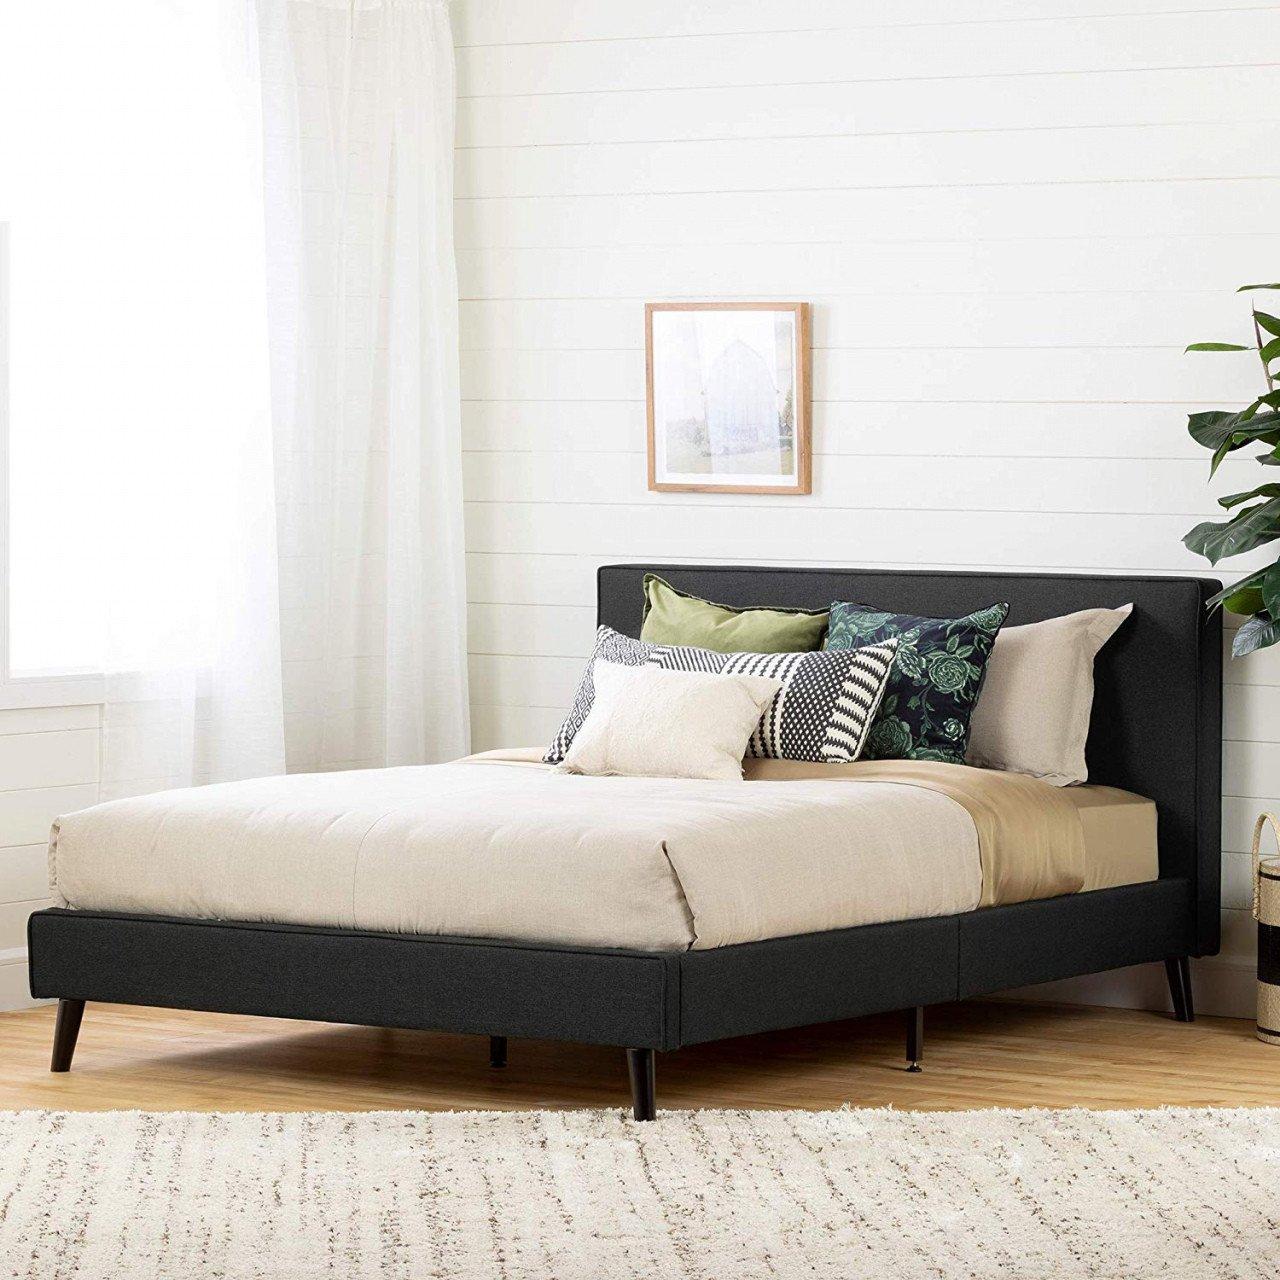 South Shore Bedroom Set New Platform Bed with Built In Nightstands — Procura Home Blog